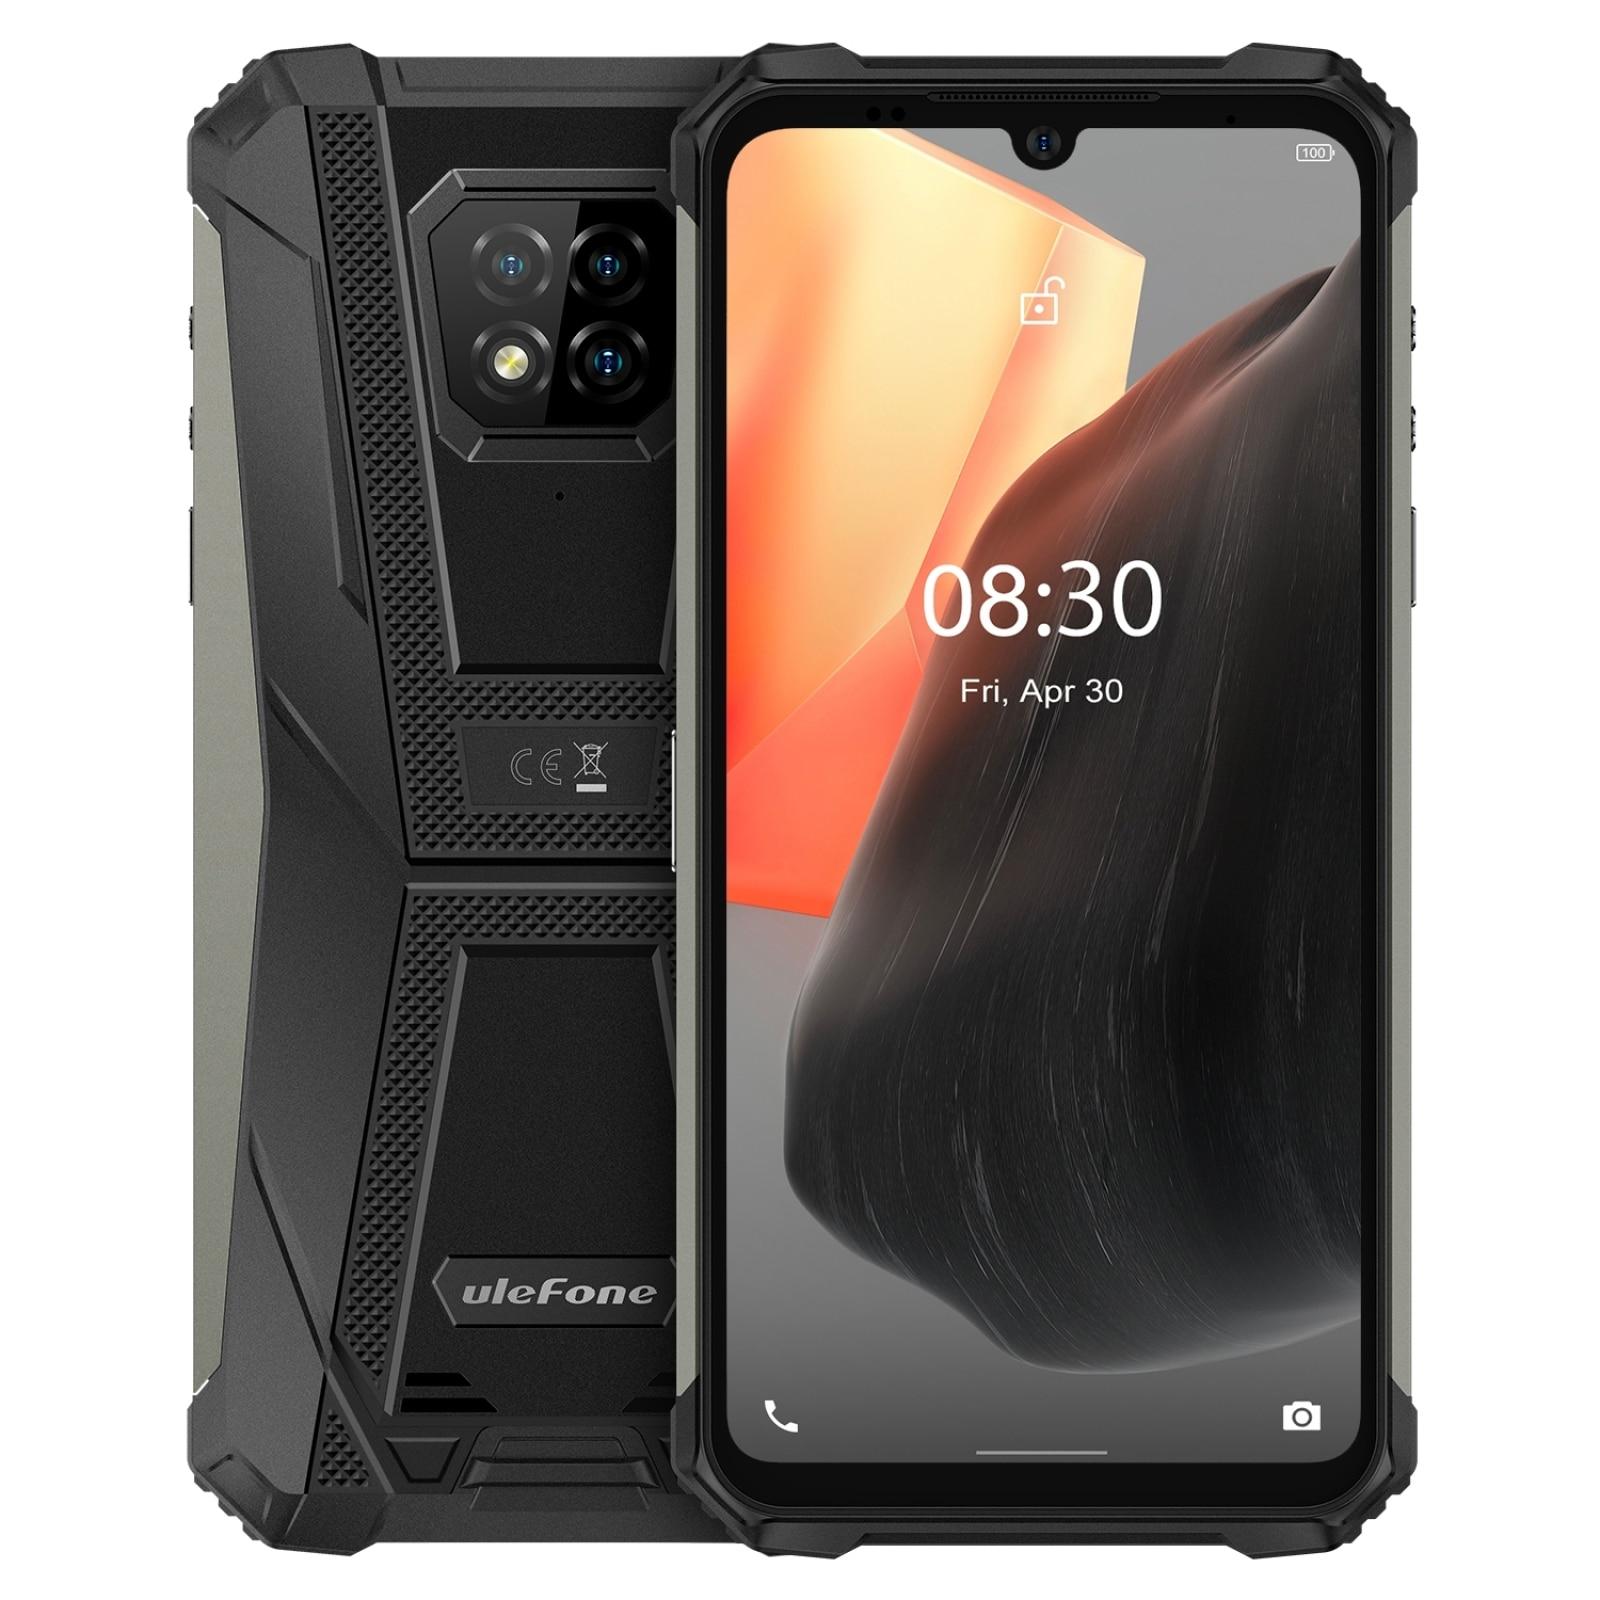 Ulefone鎧8プロIP68頑丈なスマートフォン6 + 128ギガバイト防水携帯電話6.1